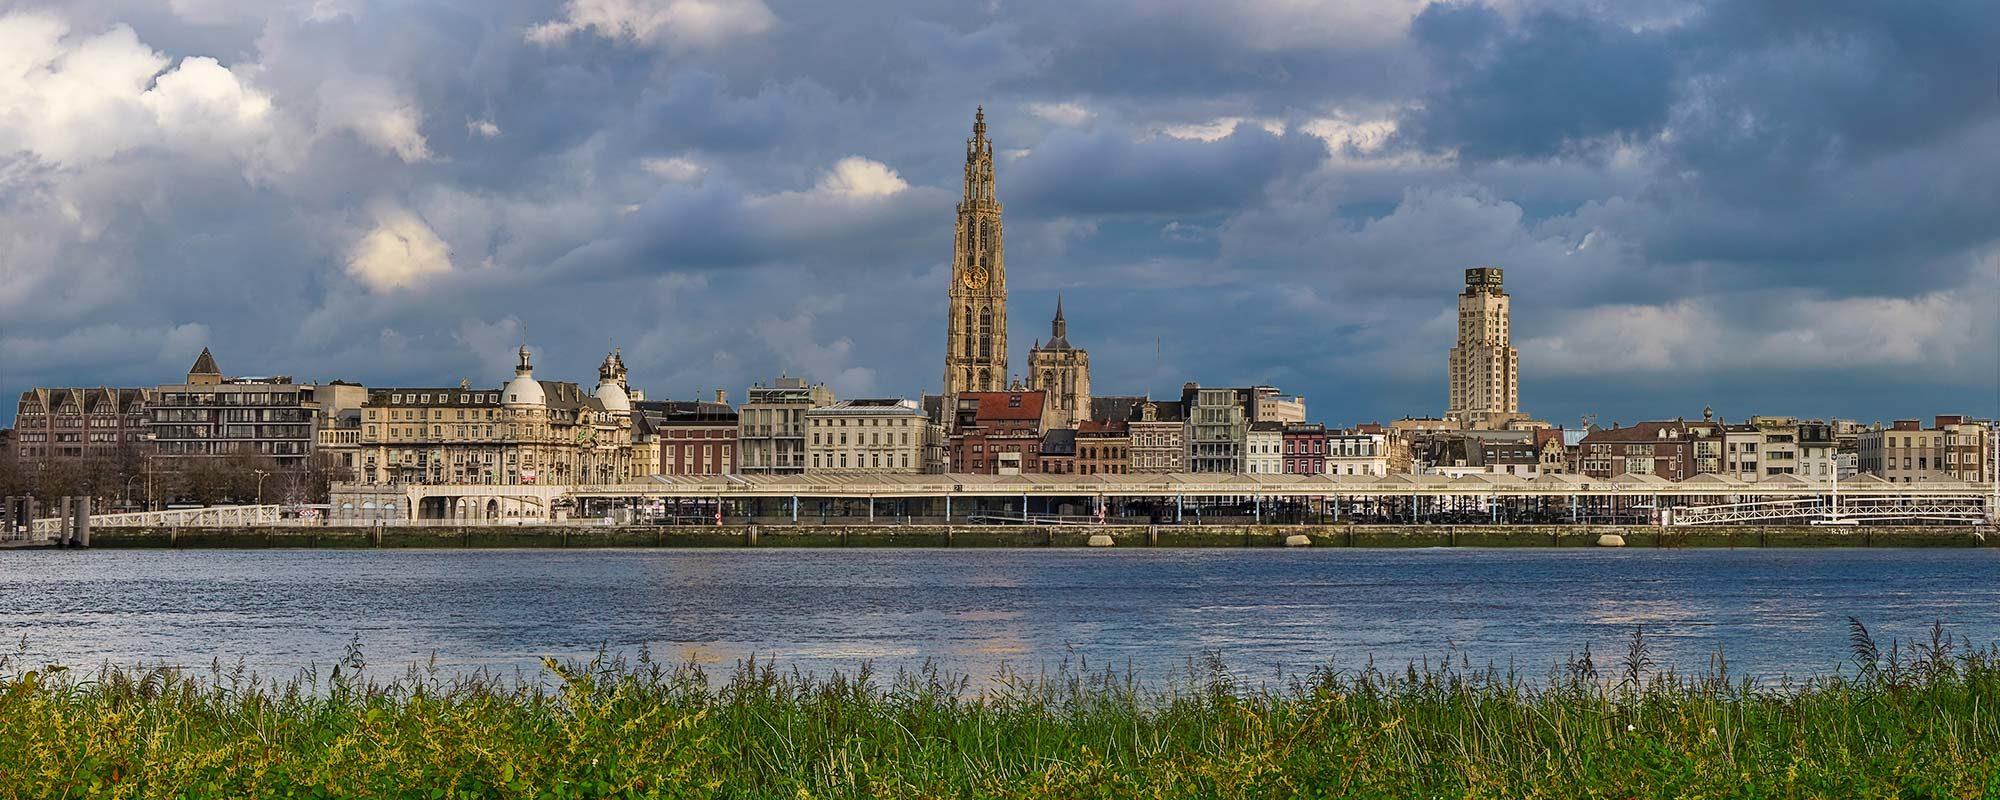 Freddy Baines - Antwerp